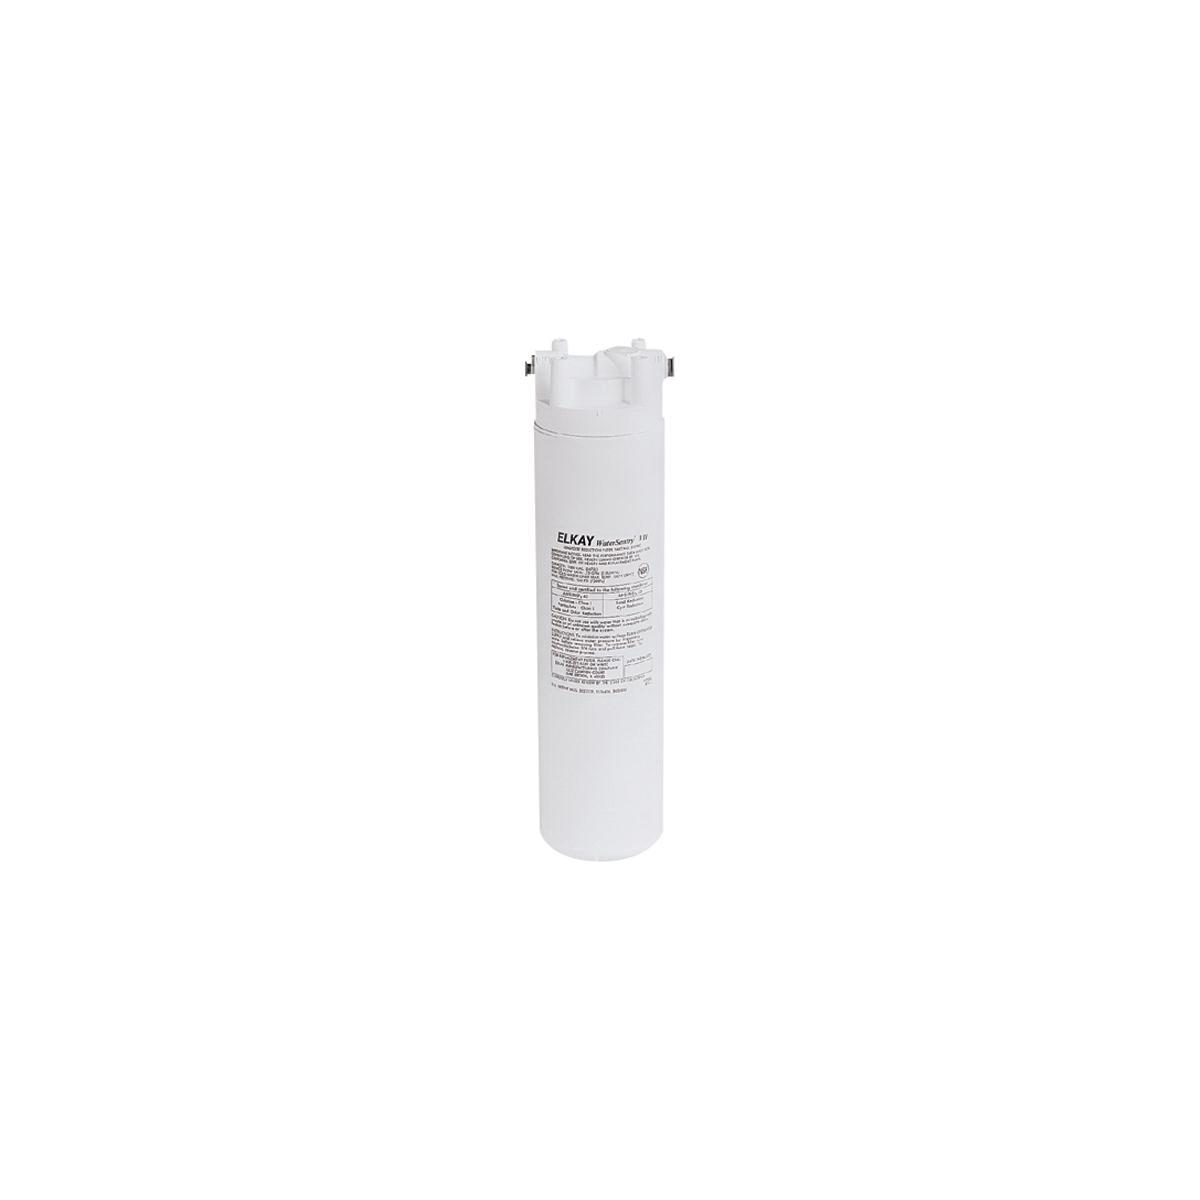 Elkay® EWF172 WaterSentry® Filter Kit, 3-1/4 in L x 3-1/4 in W x 12-1/2 in H, Plastic, Domestic